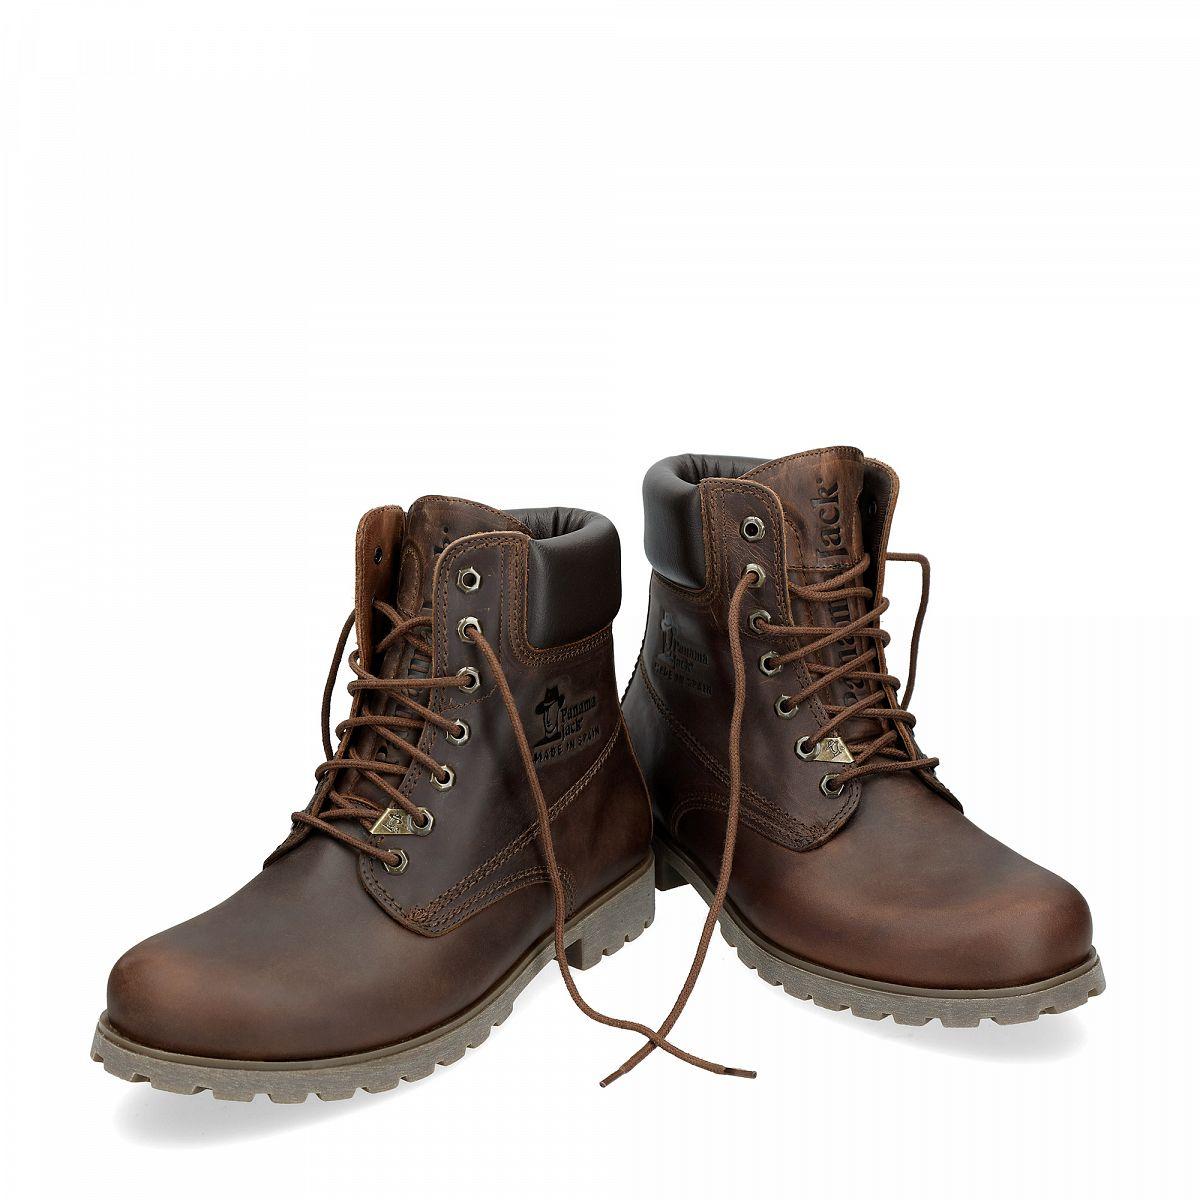 07a23433 Men's boot PANAMA 03 tan | PANAMA JACK® Official